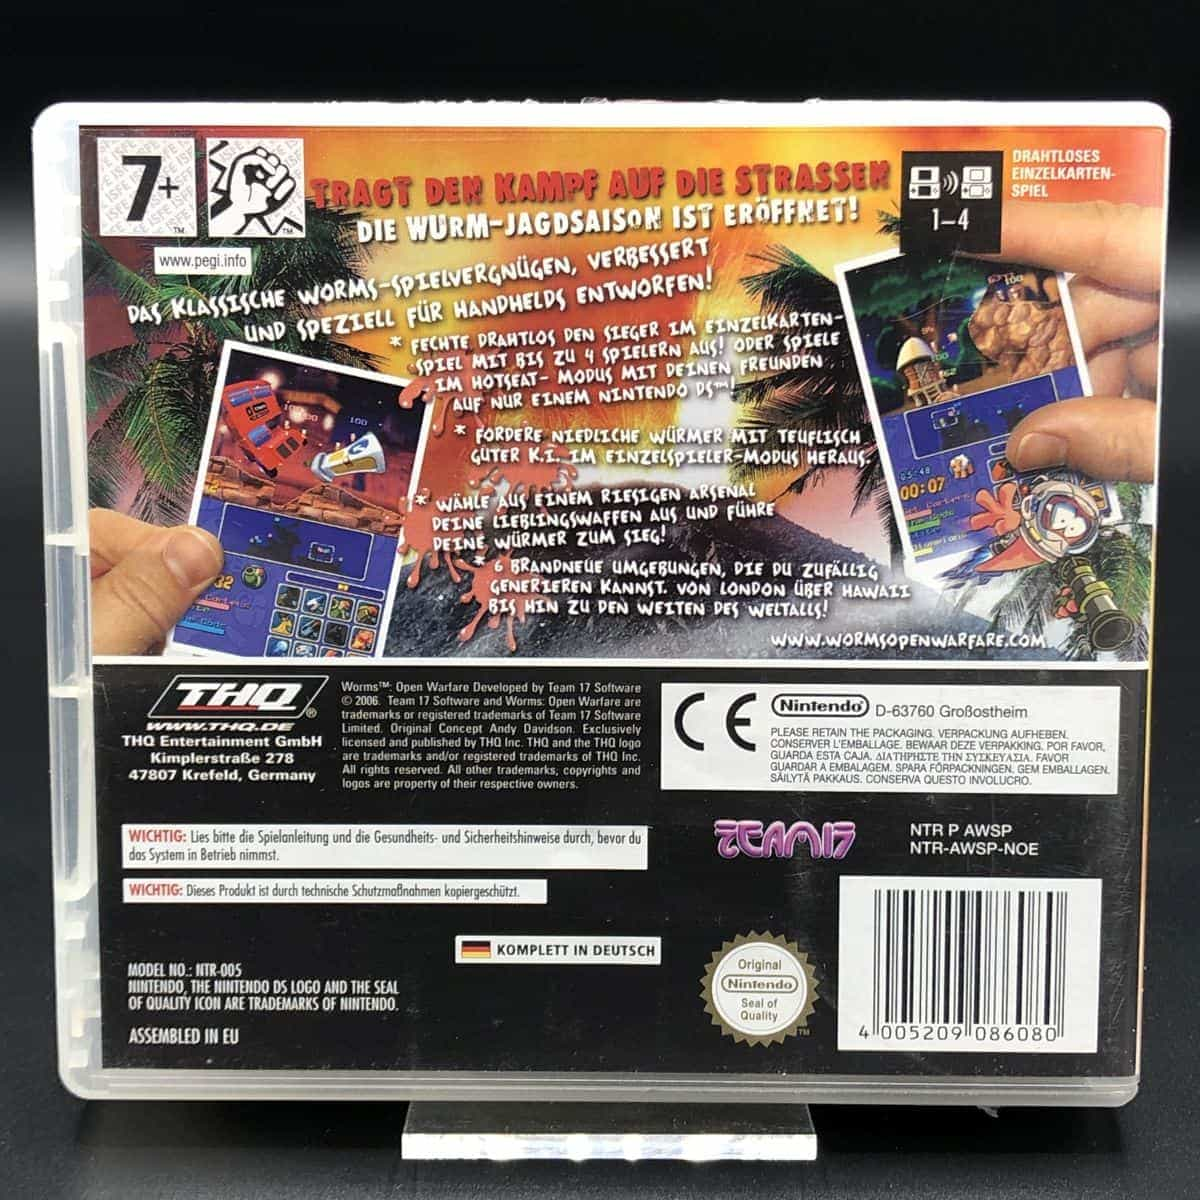 Worms: Open Warfare (Komplett) (Sehr gut) Nintendo DS